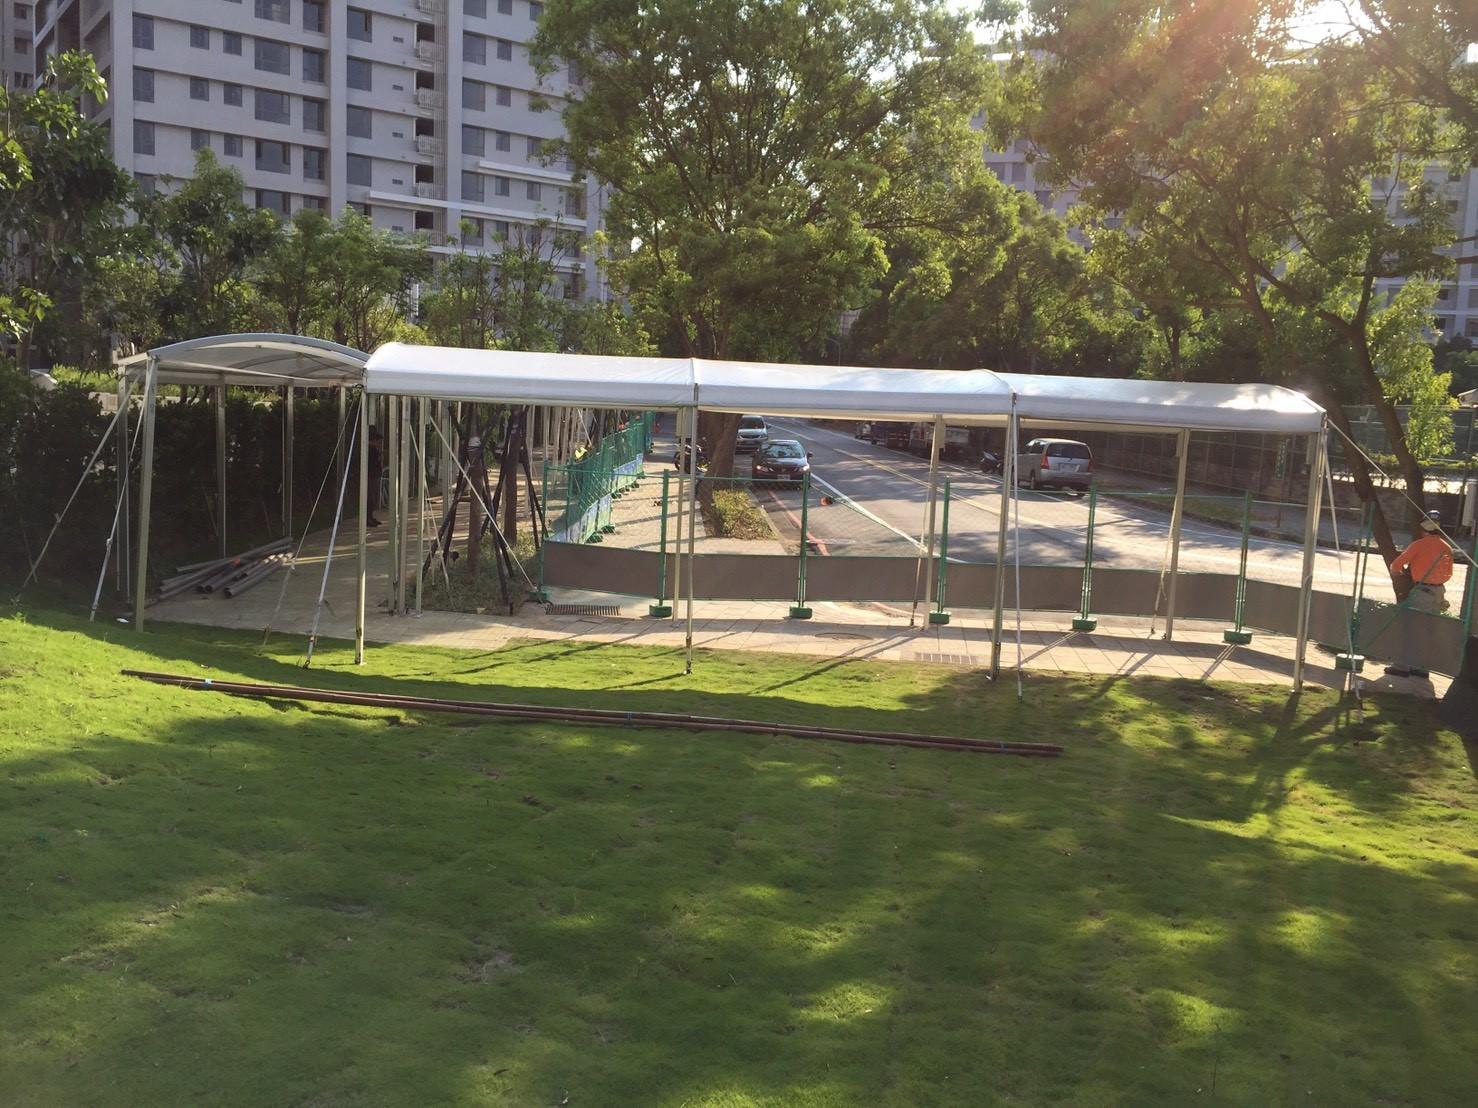 3M x 3M Corridor Tent - 2017 29th SUMMER UNIVERSIADE